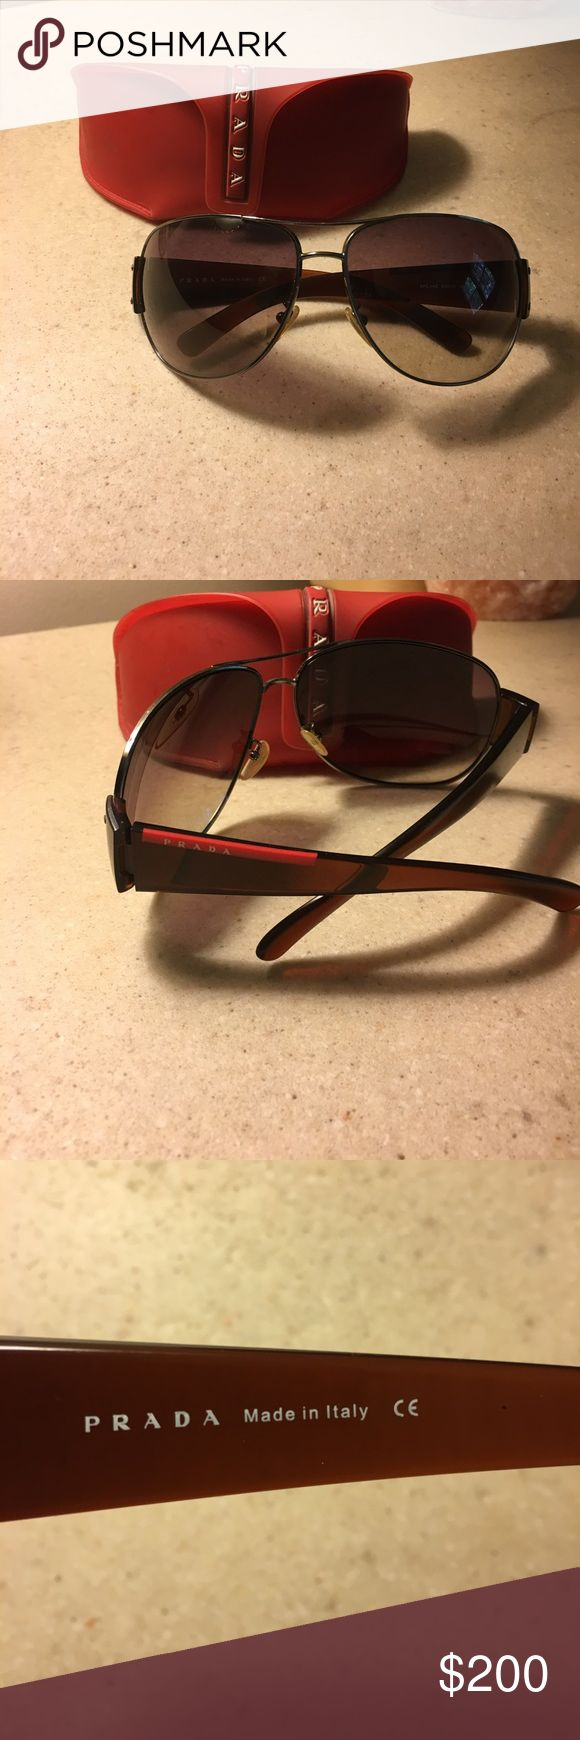 Men's Prada Sunglasses Men's Prada sunglasses in great condition! Authentic with protective original case. Prada Accessories Sunglasses